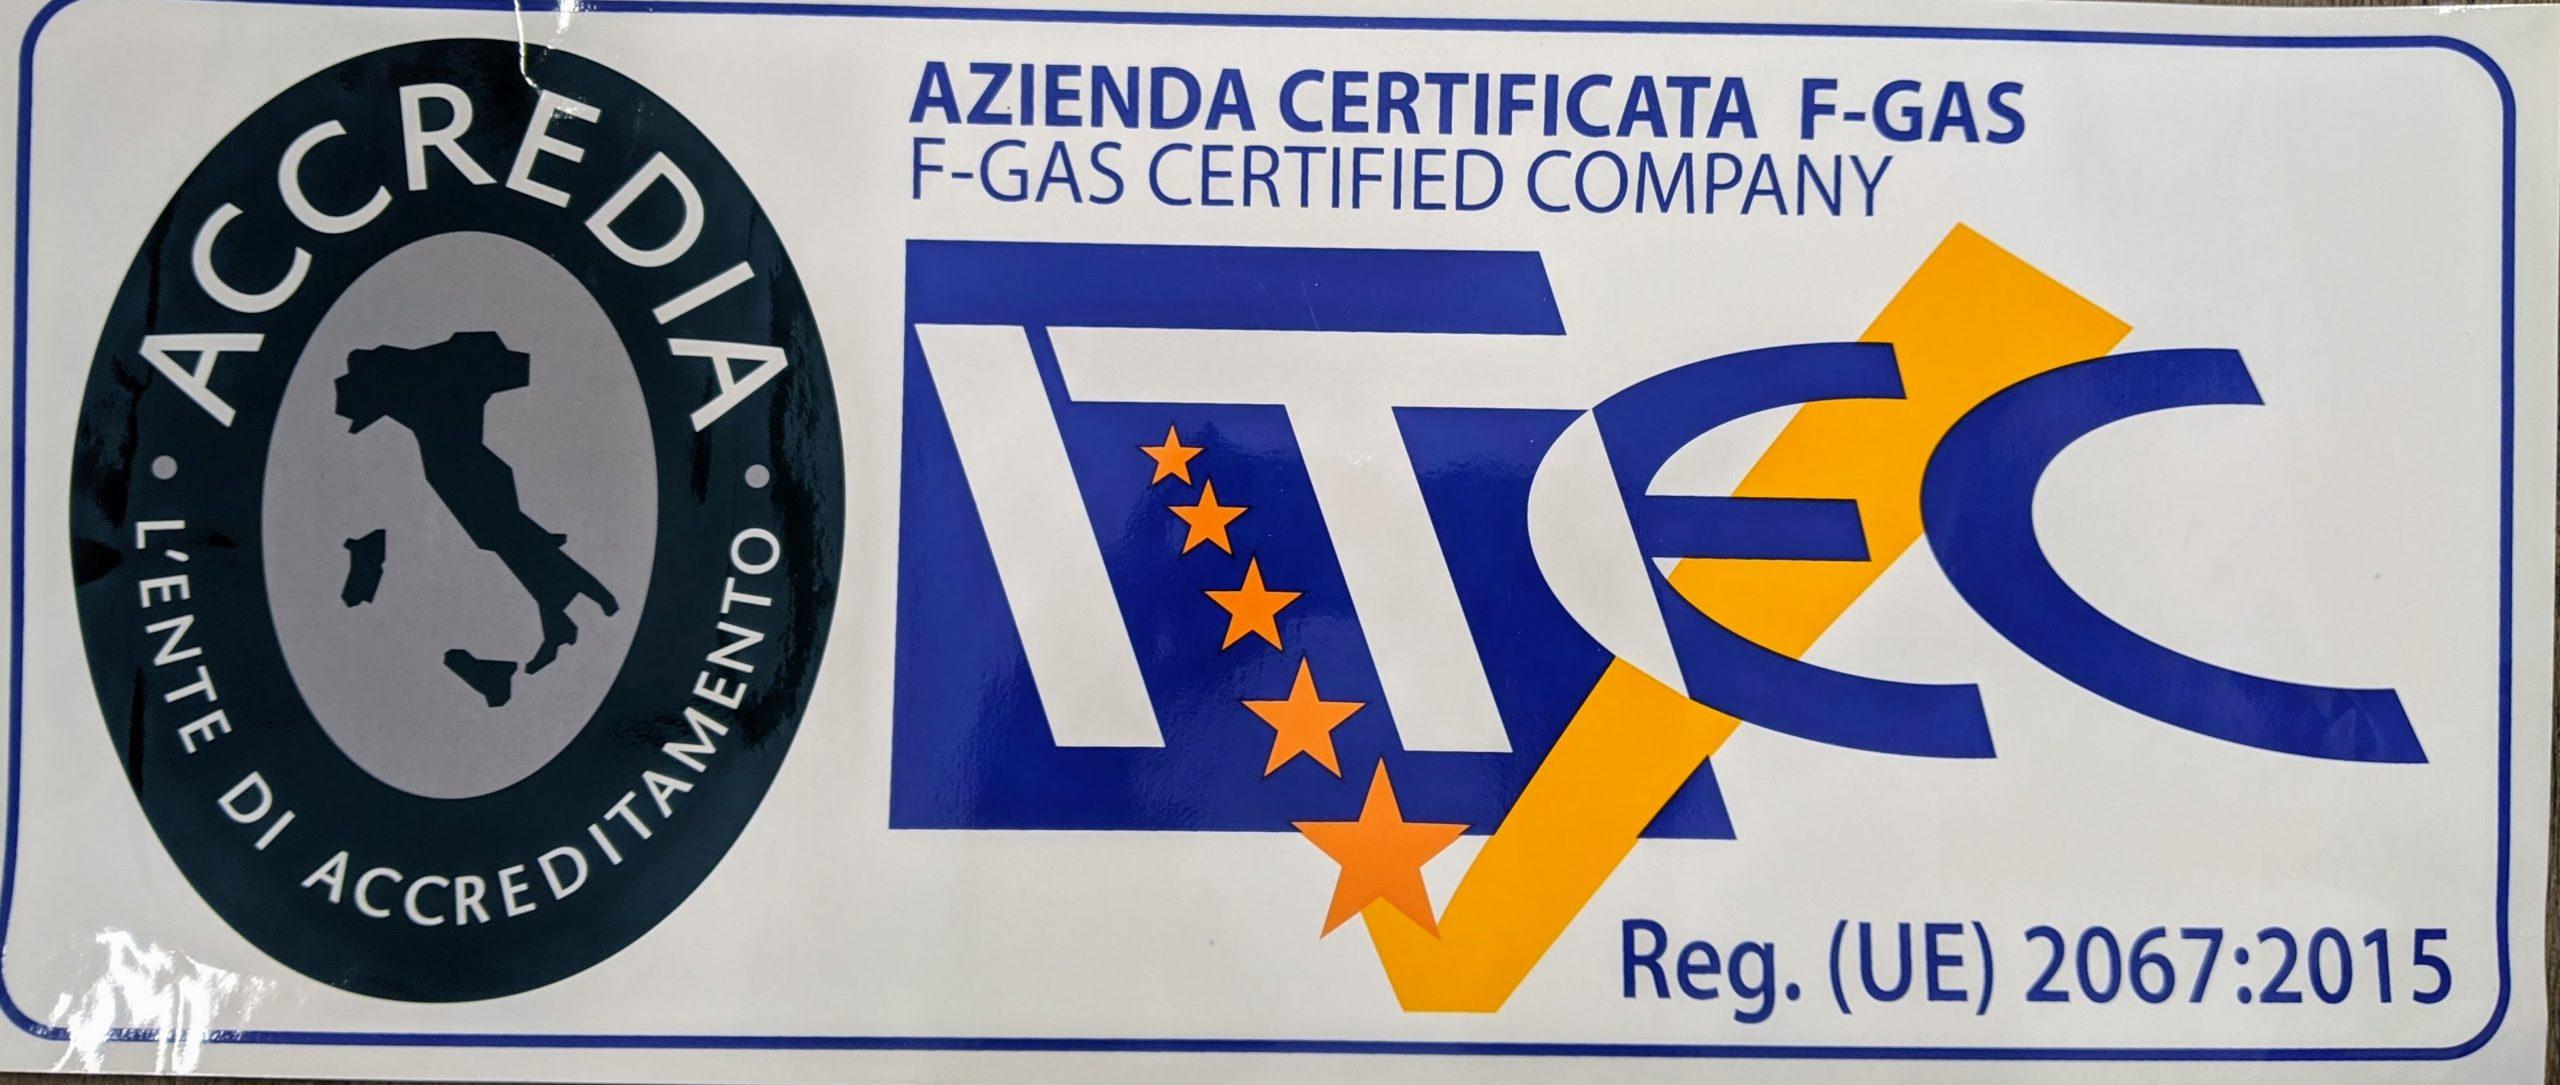 Auxo è azienda certificata F-gas